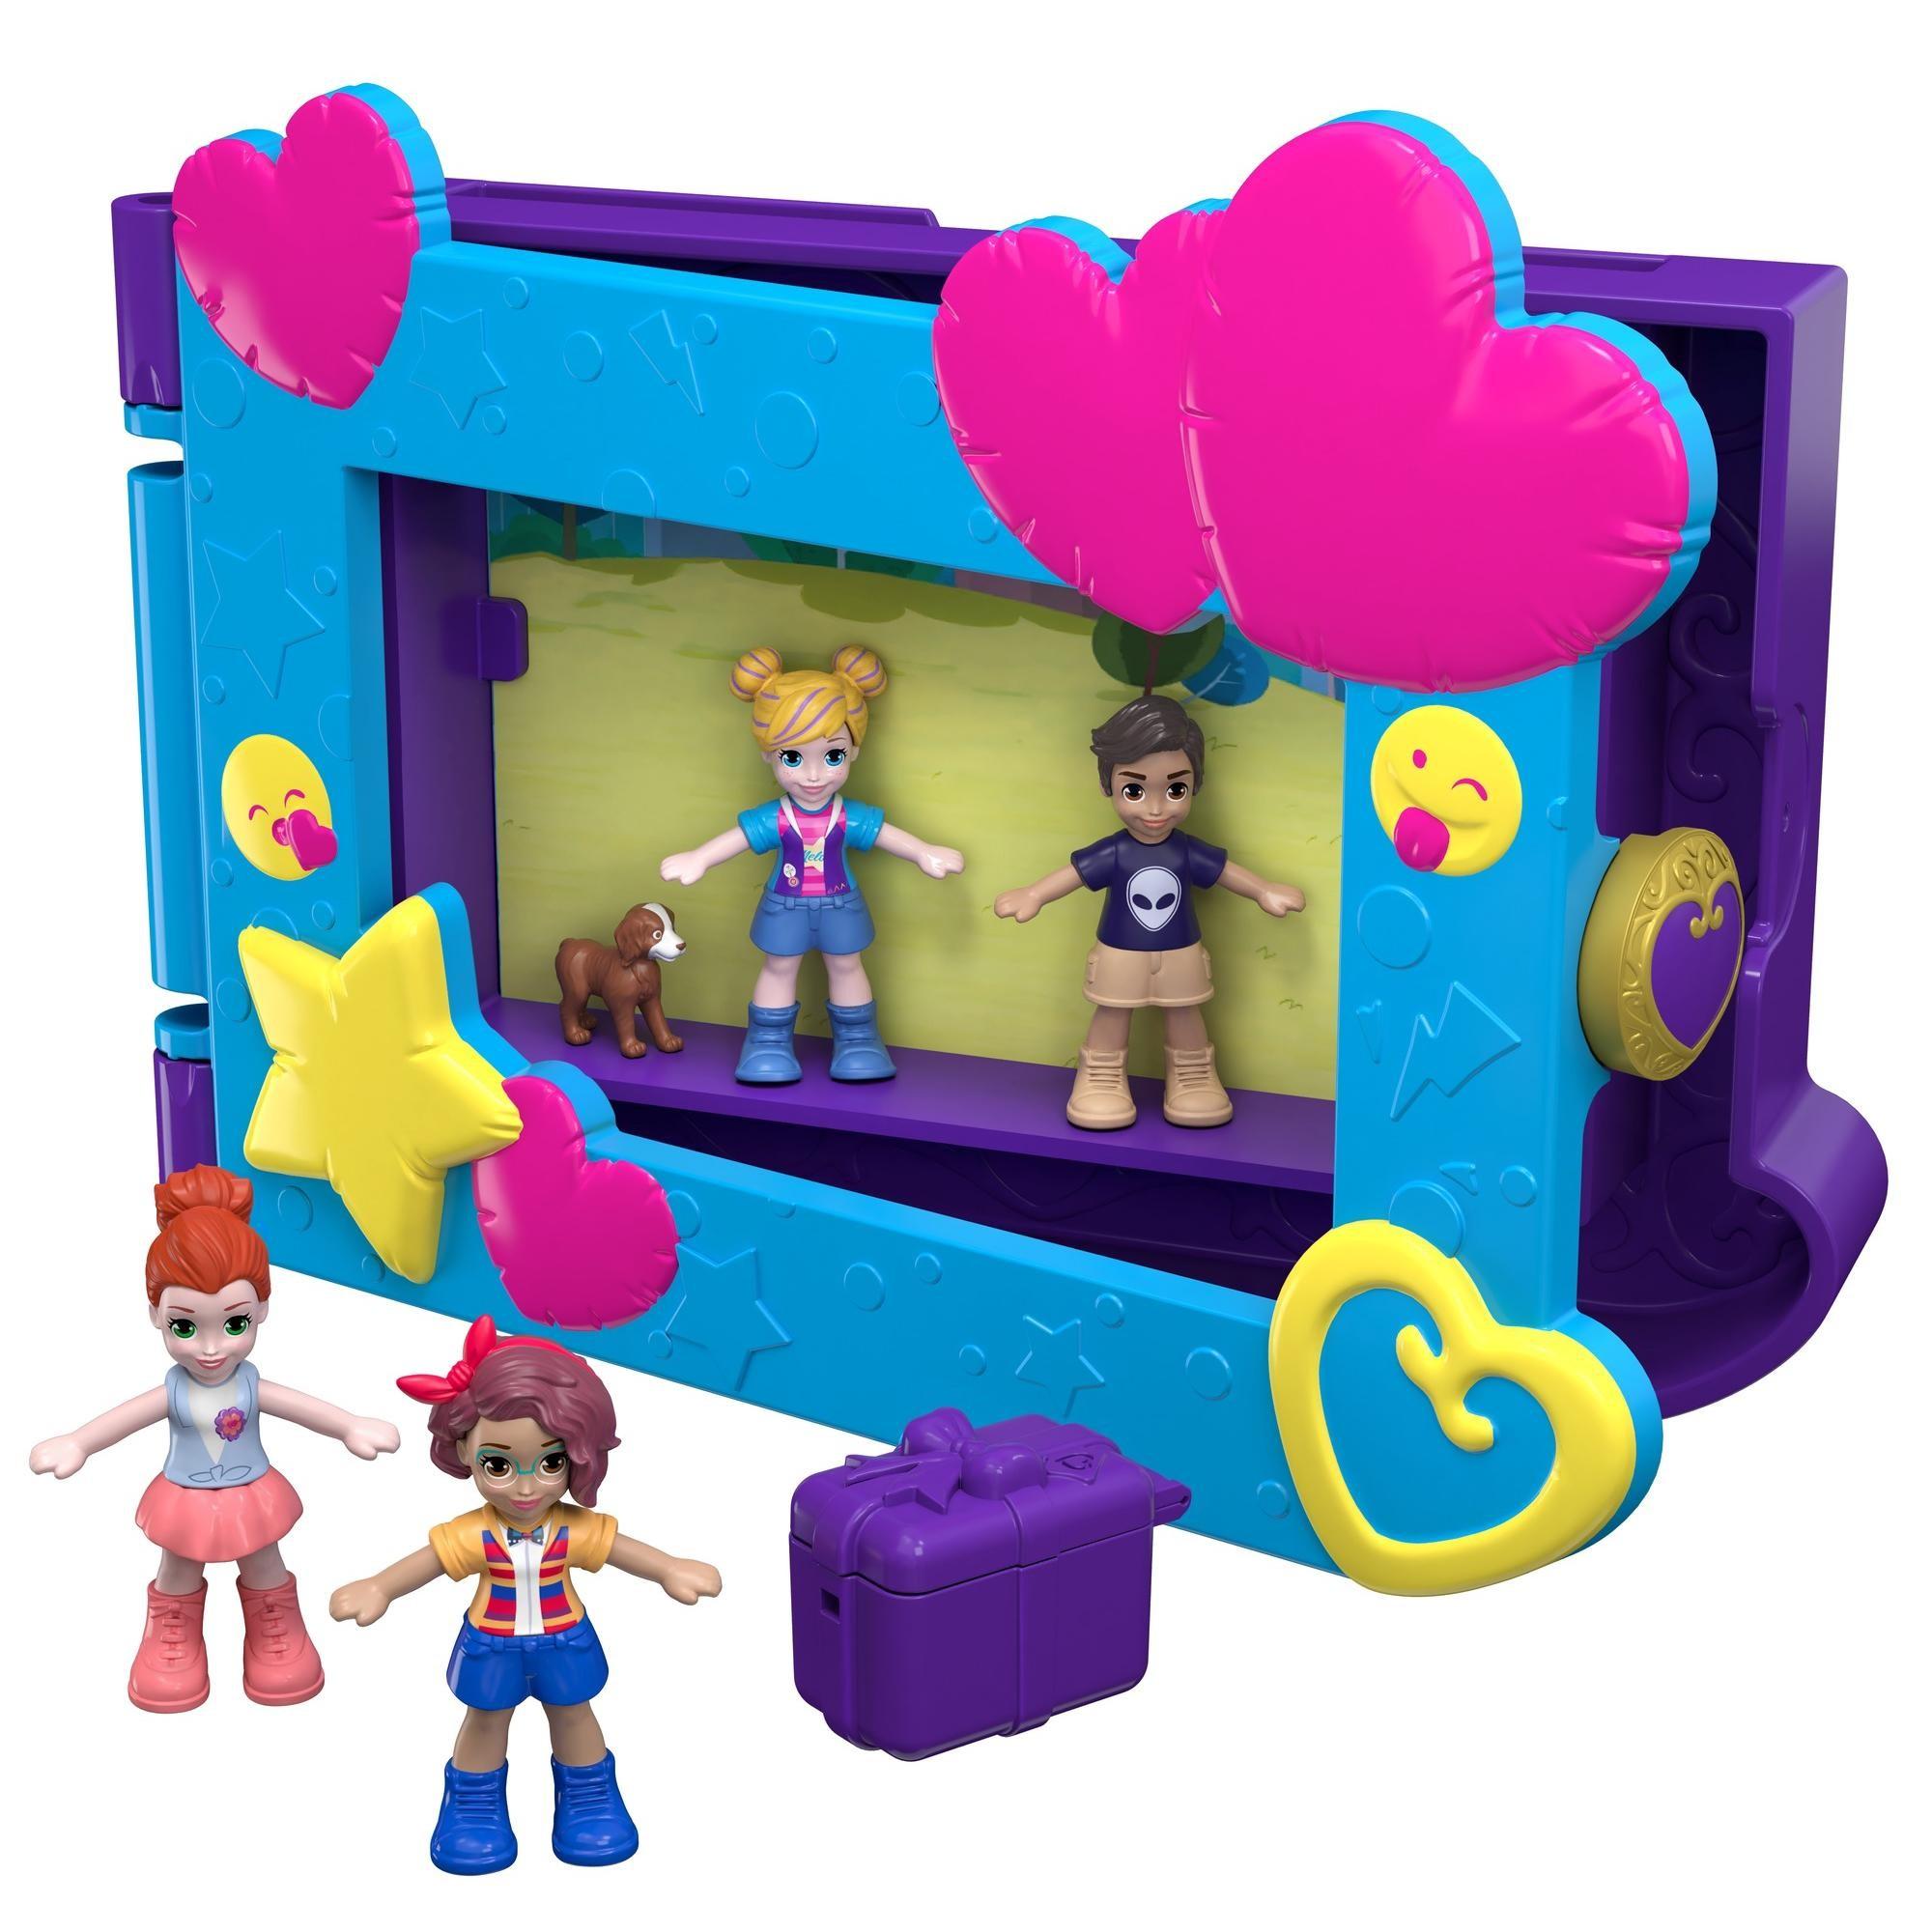 Polly Pocket Say Freeze! Frame Pocket World Play Set